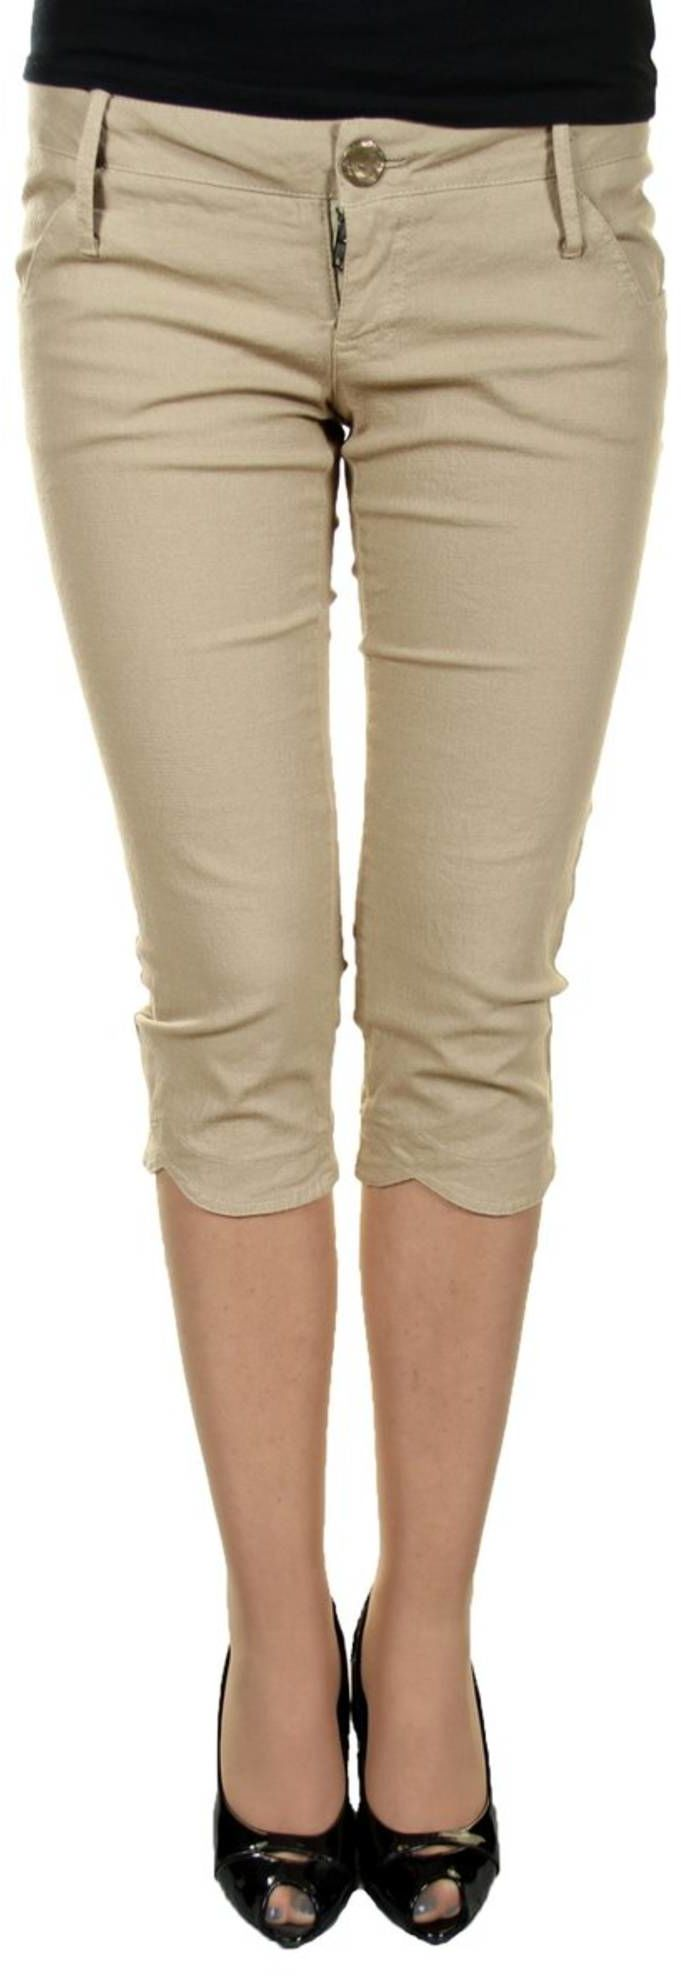 KING''S JEANS Capri trousers Women